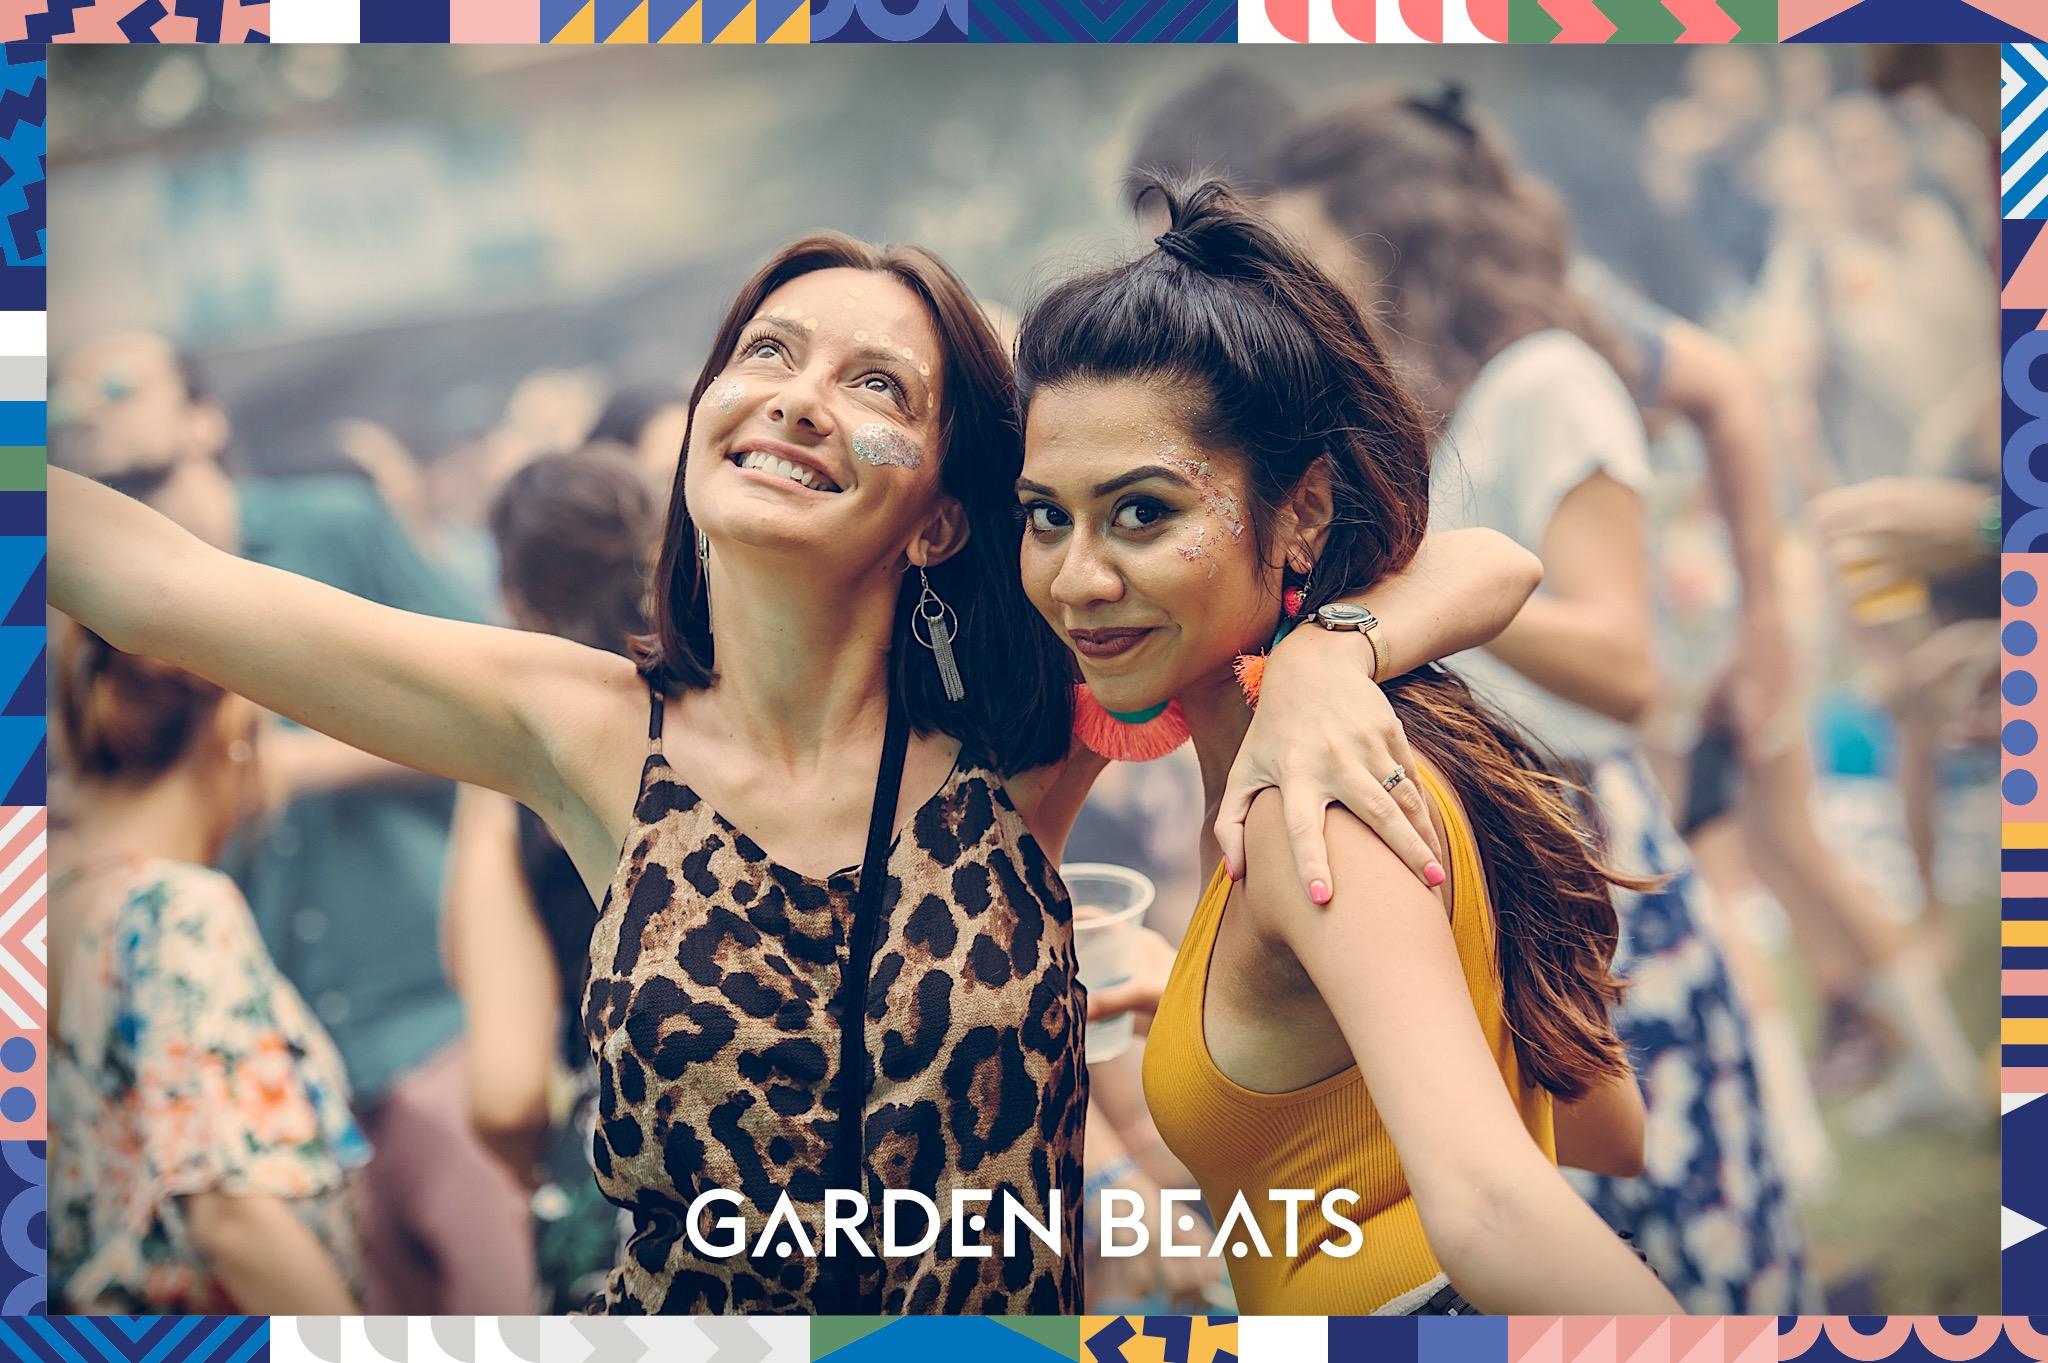 03032018_GardenBeats_Colossal562_Watermarked.jpg